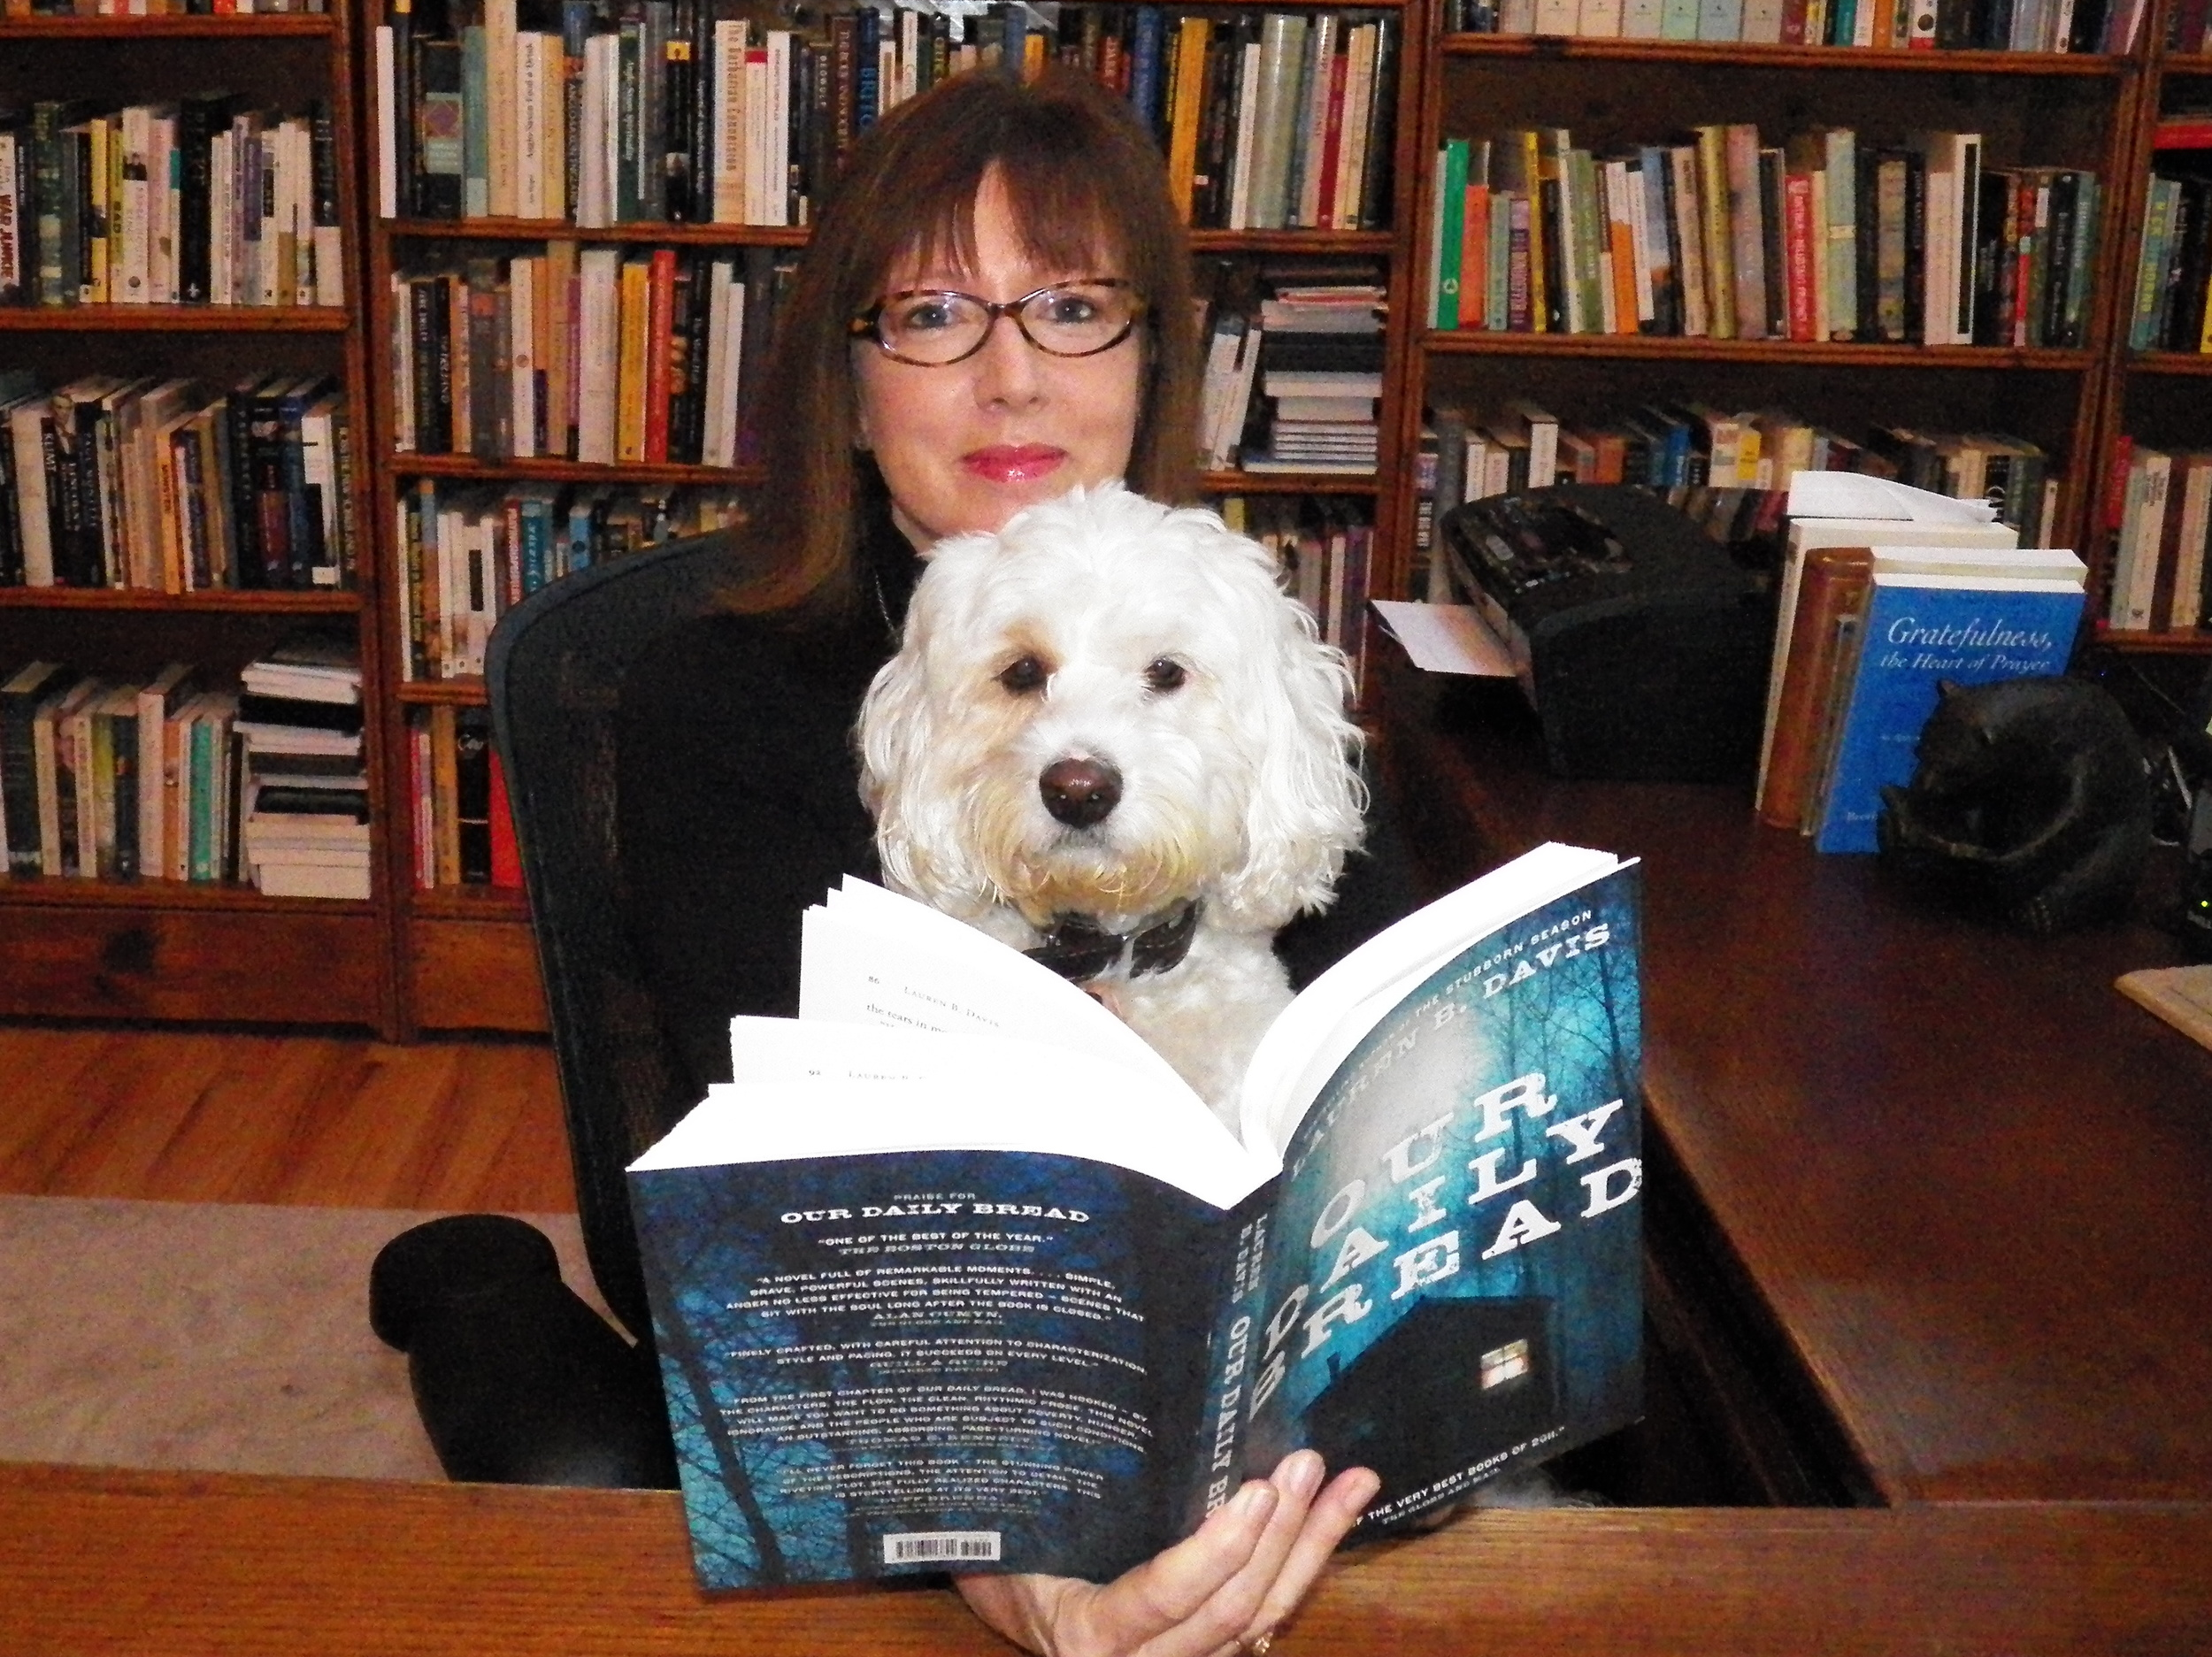 Bailey likes Lauren's book - kodak @ Sept 9 '12.jpg